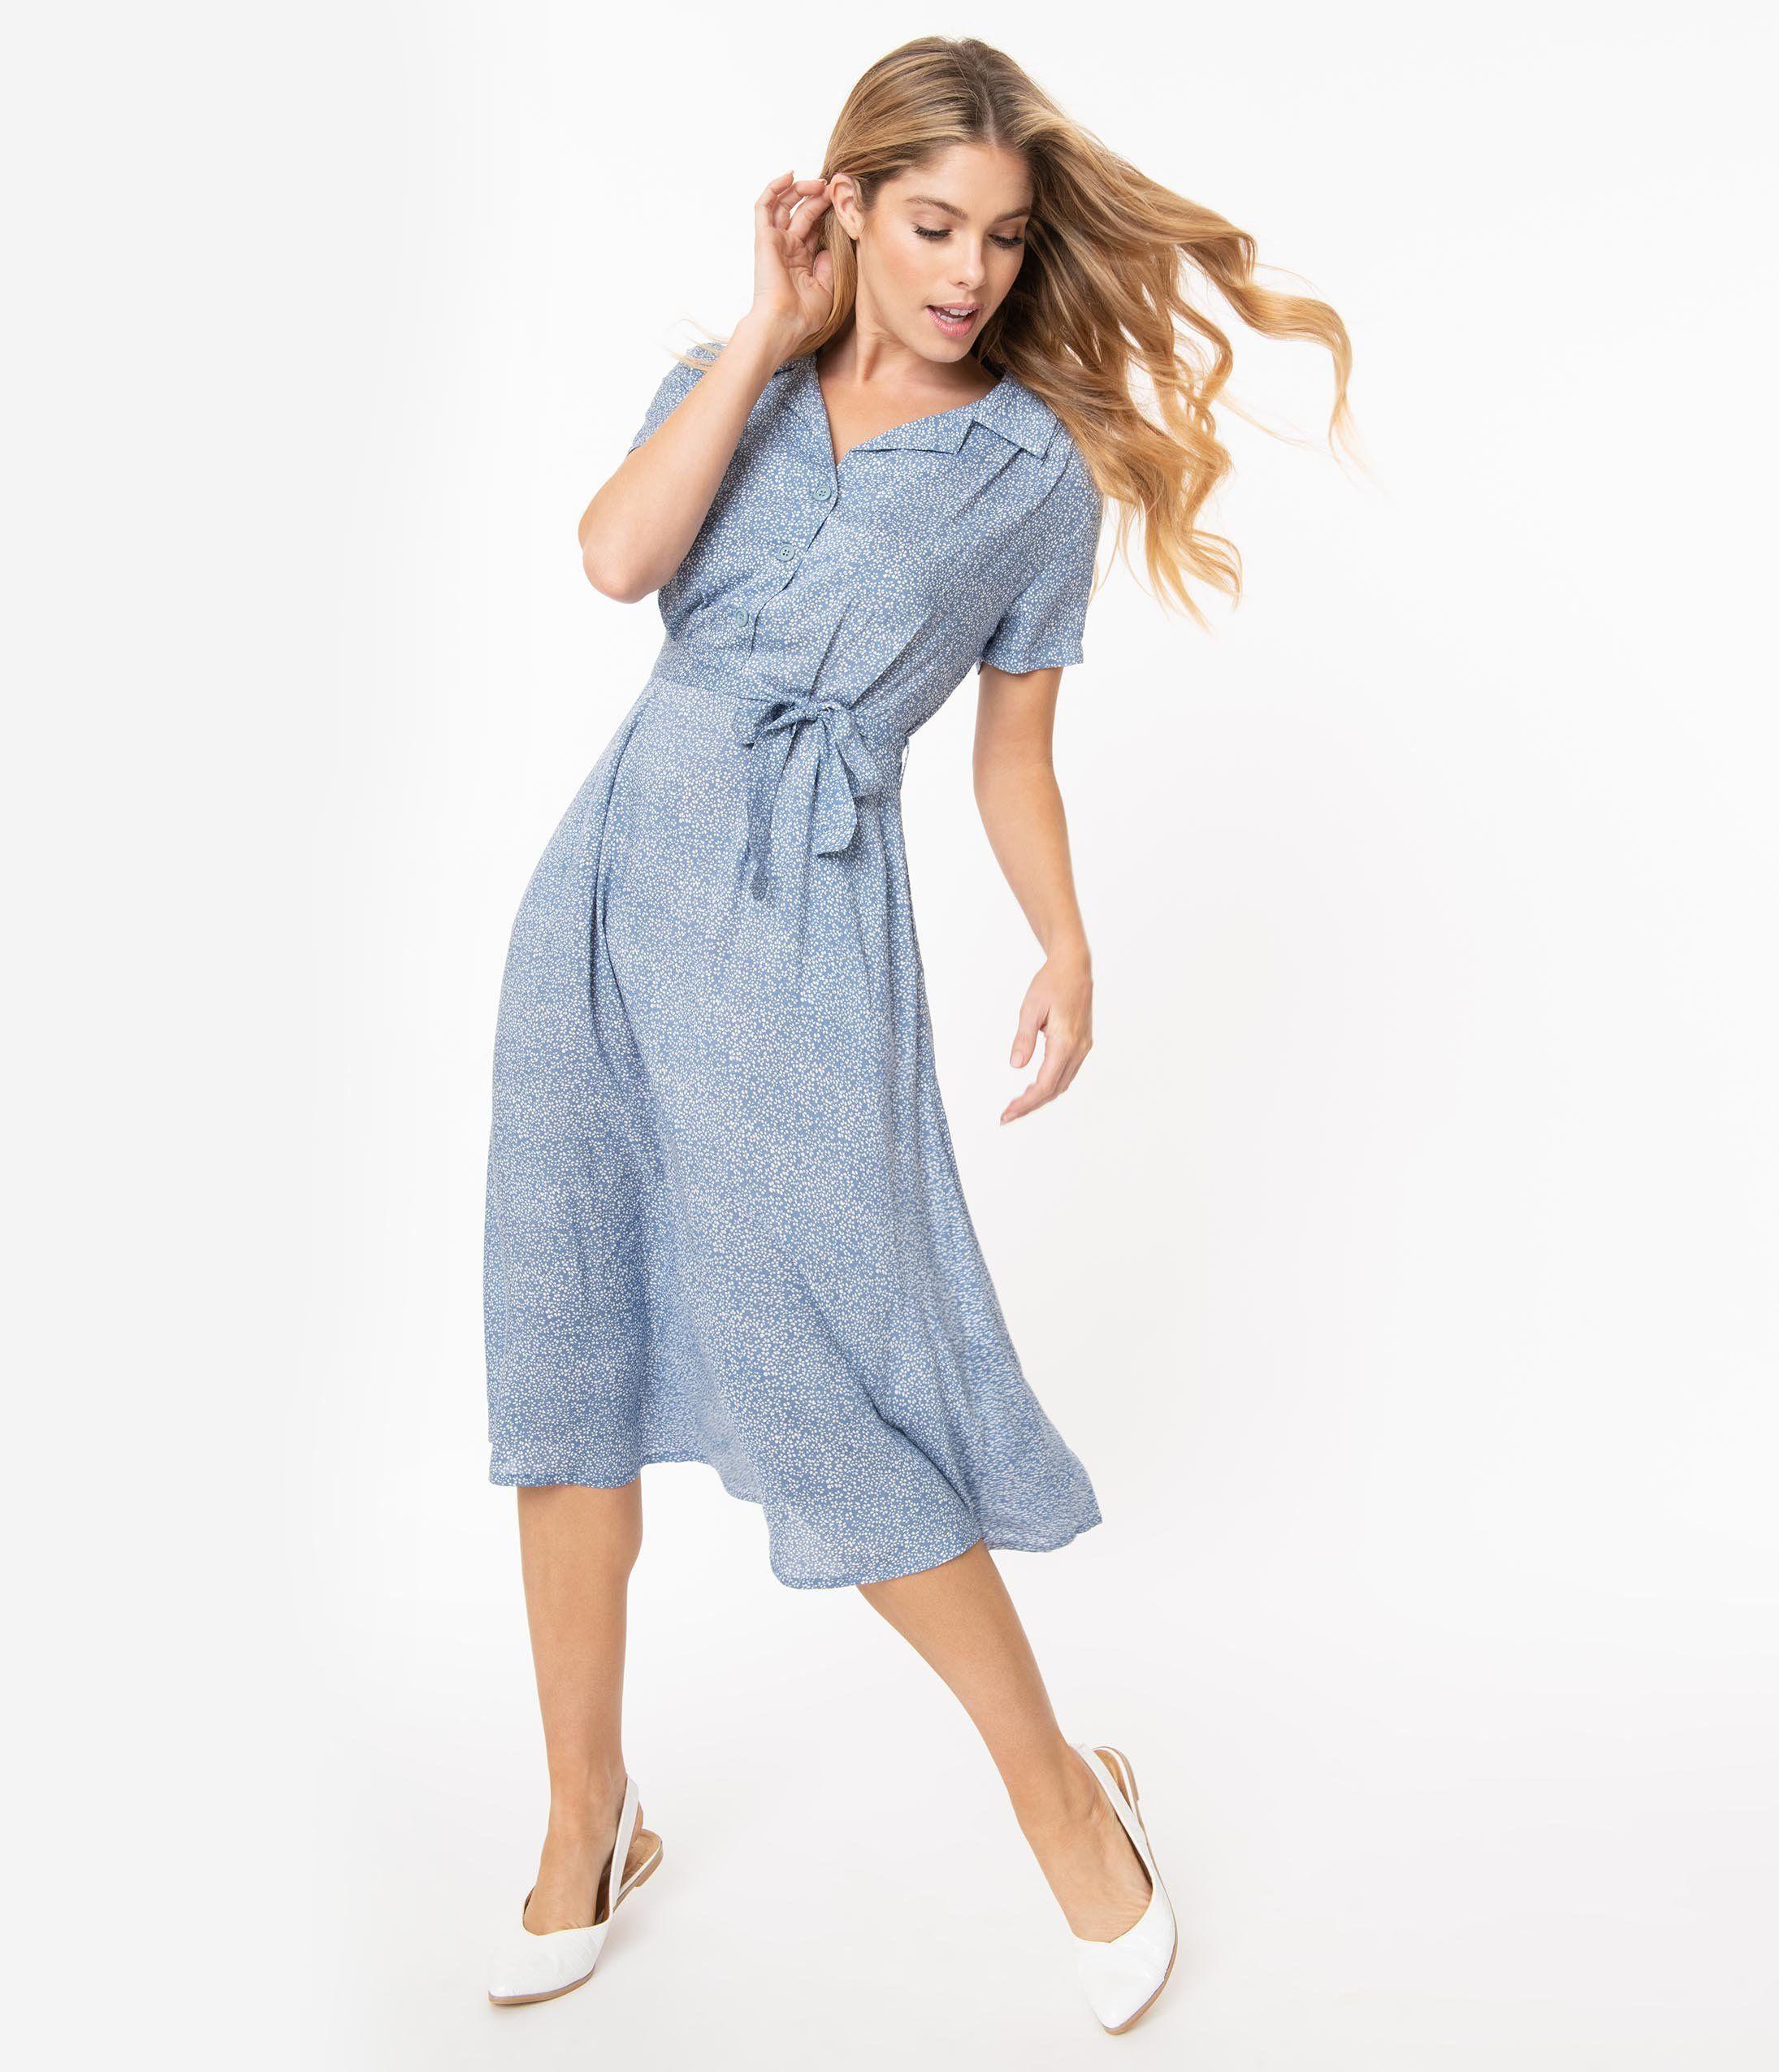 500 Vintage Style Dresses For Sale Vintage Inspired Dresses Floral Print Midi Dress Blue Midi Dress Dusty Blue Dress [ 2550 x 2190 Pixel ]